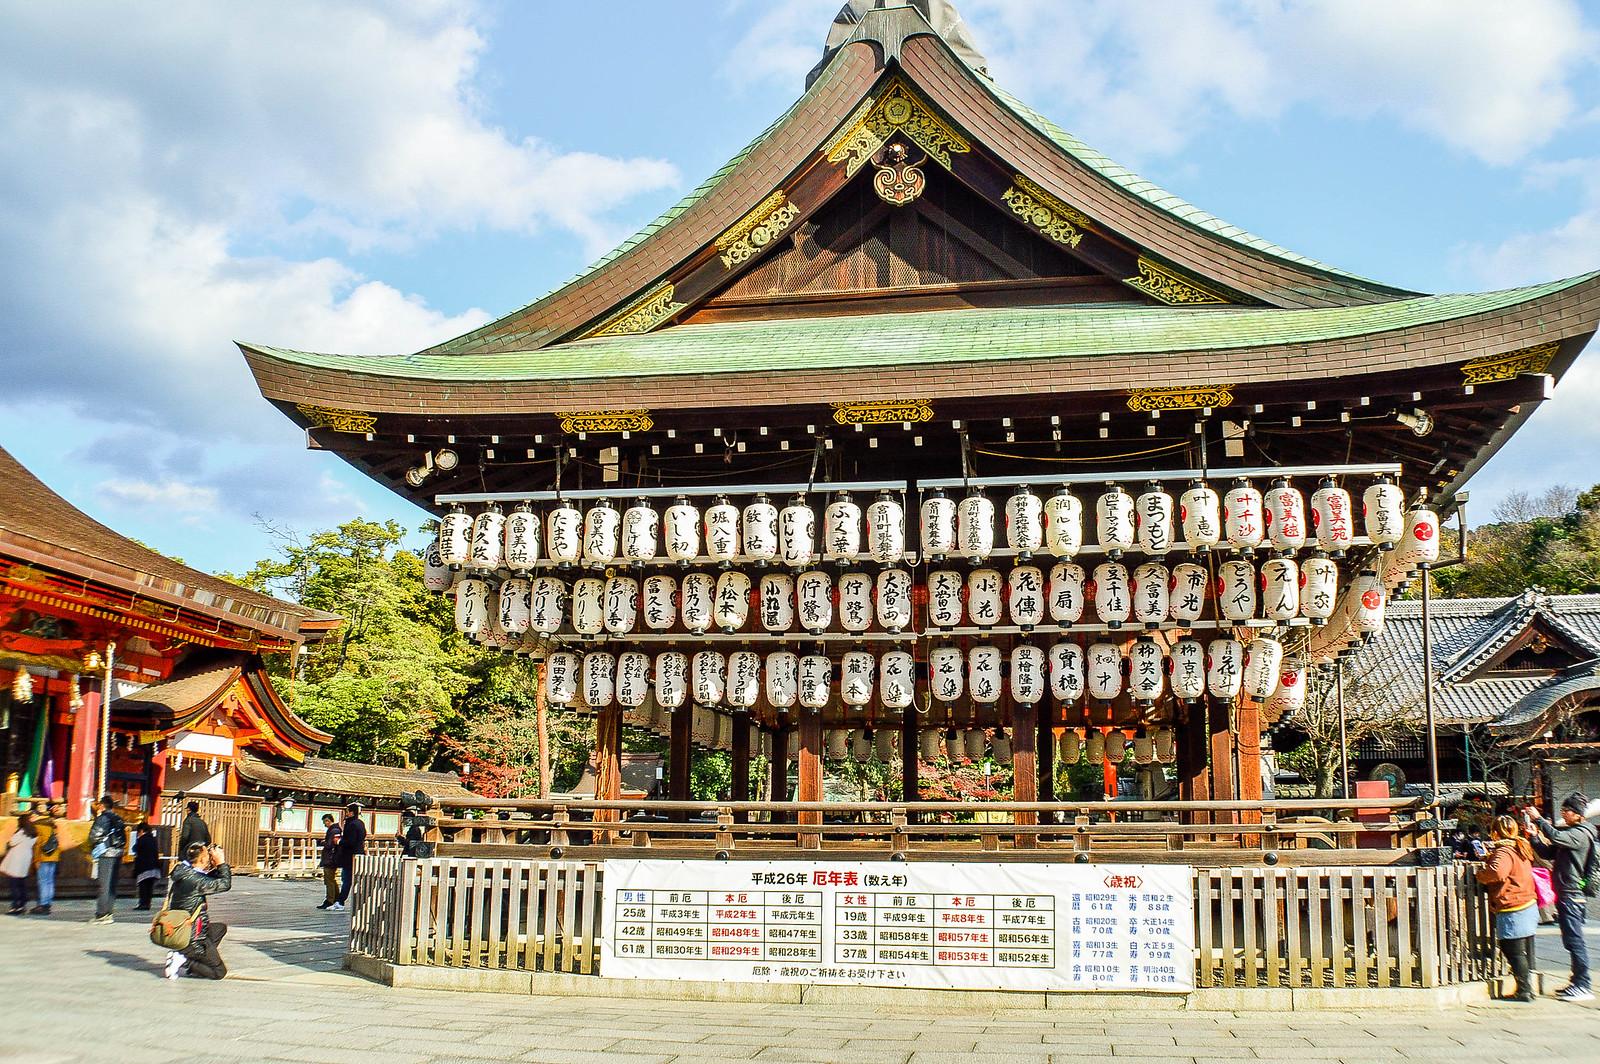 Fushimi Inari Taisha